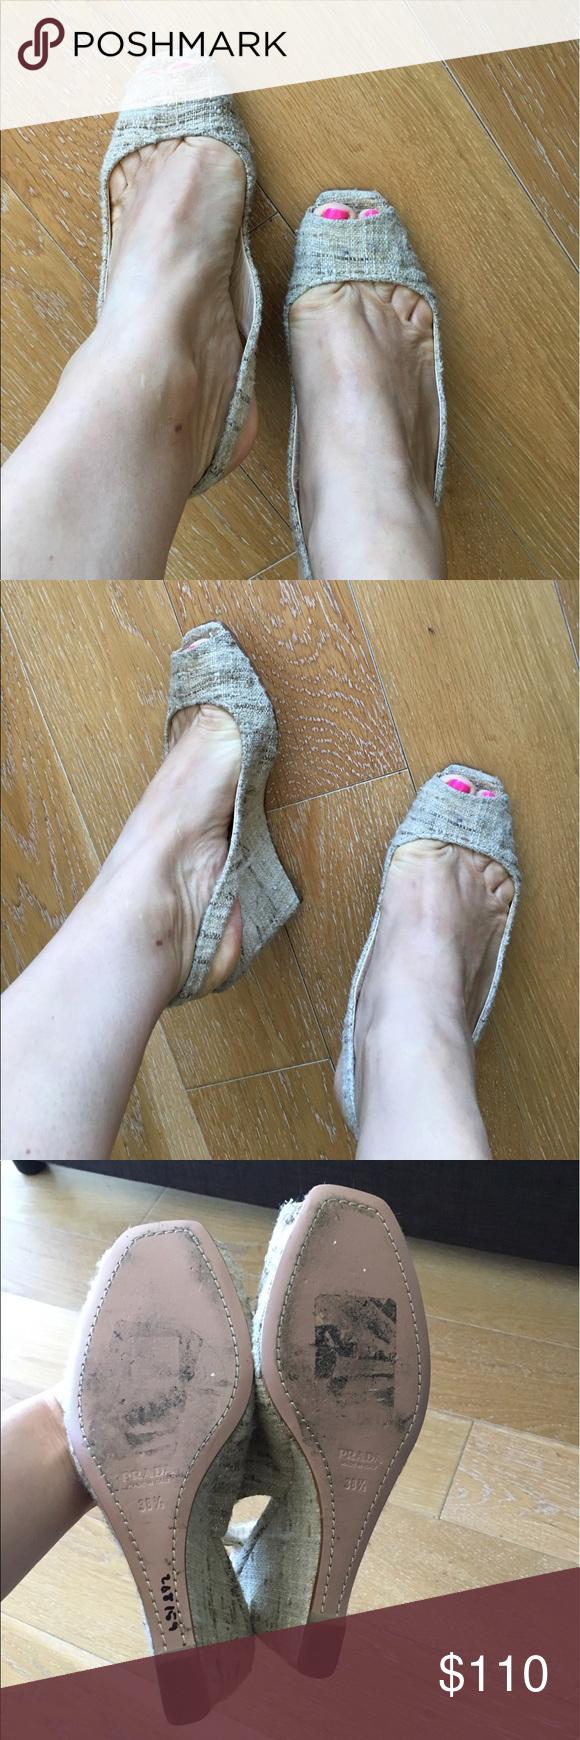 Prada peep toe wedge sling back sandals Beige/brown fabric upper, sling backs with 3.5 inch wedge heel. Size 38.5. Made in Italy. Prada Shoes Sandals